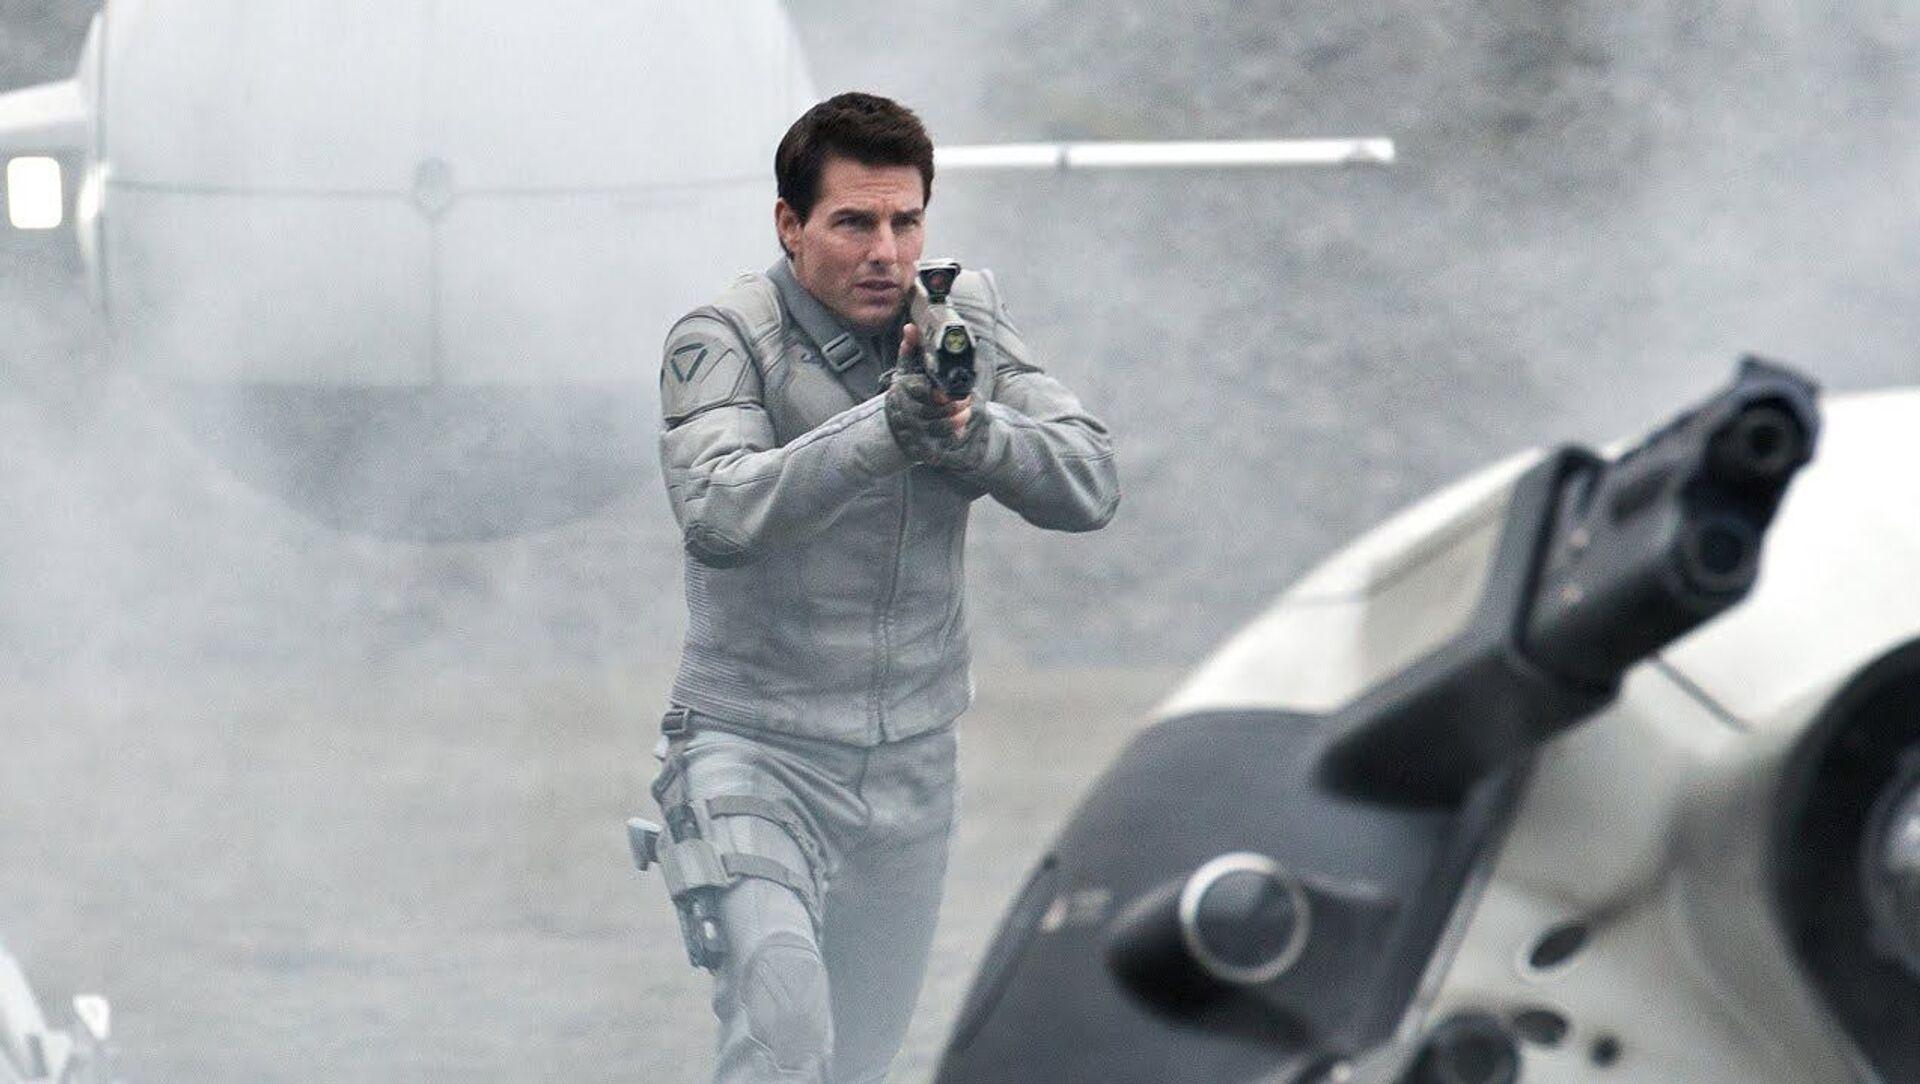 Tom Cruise en la película 'Oblivion' - Sputnik Mundo, 1920, 05.05.2020